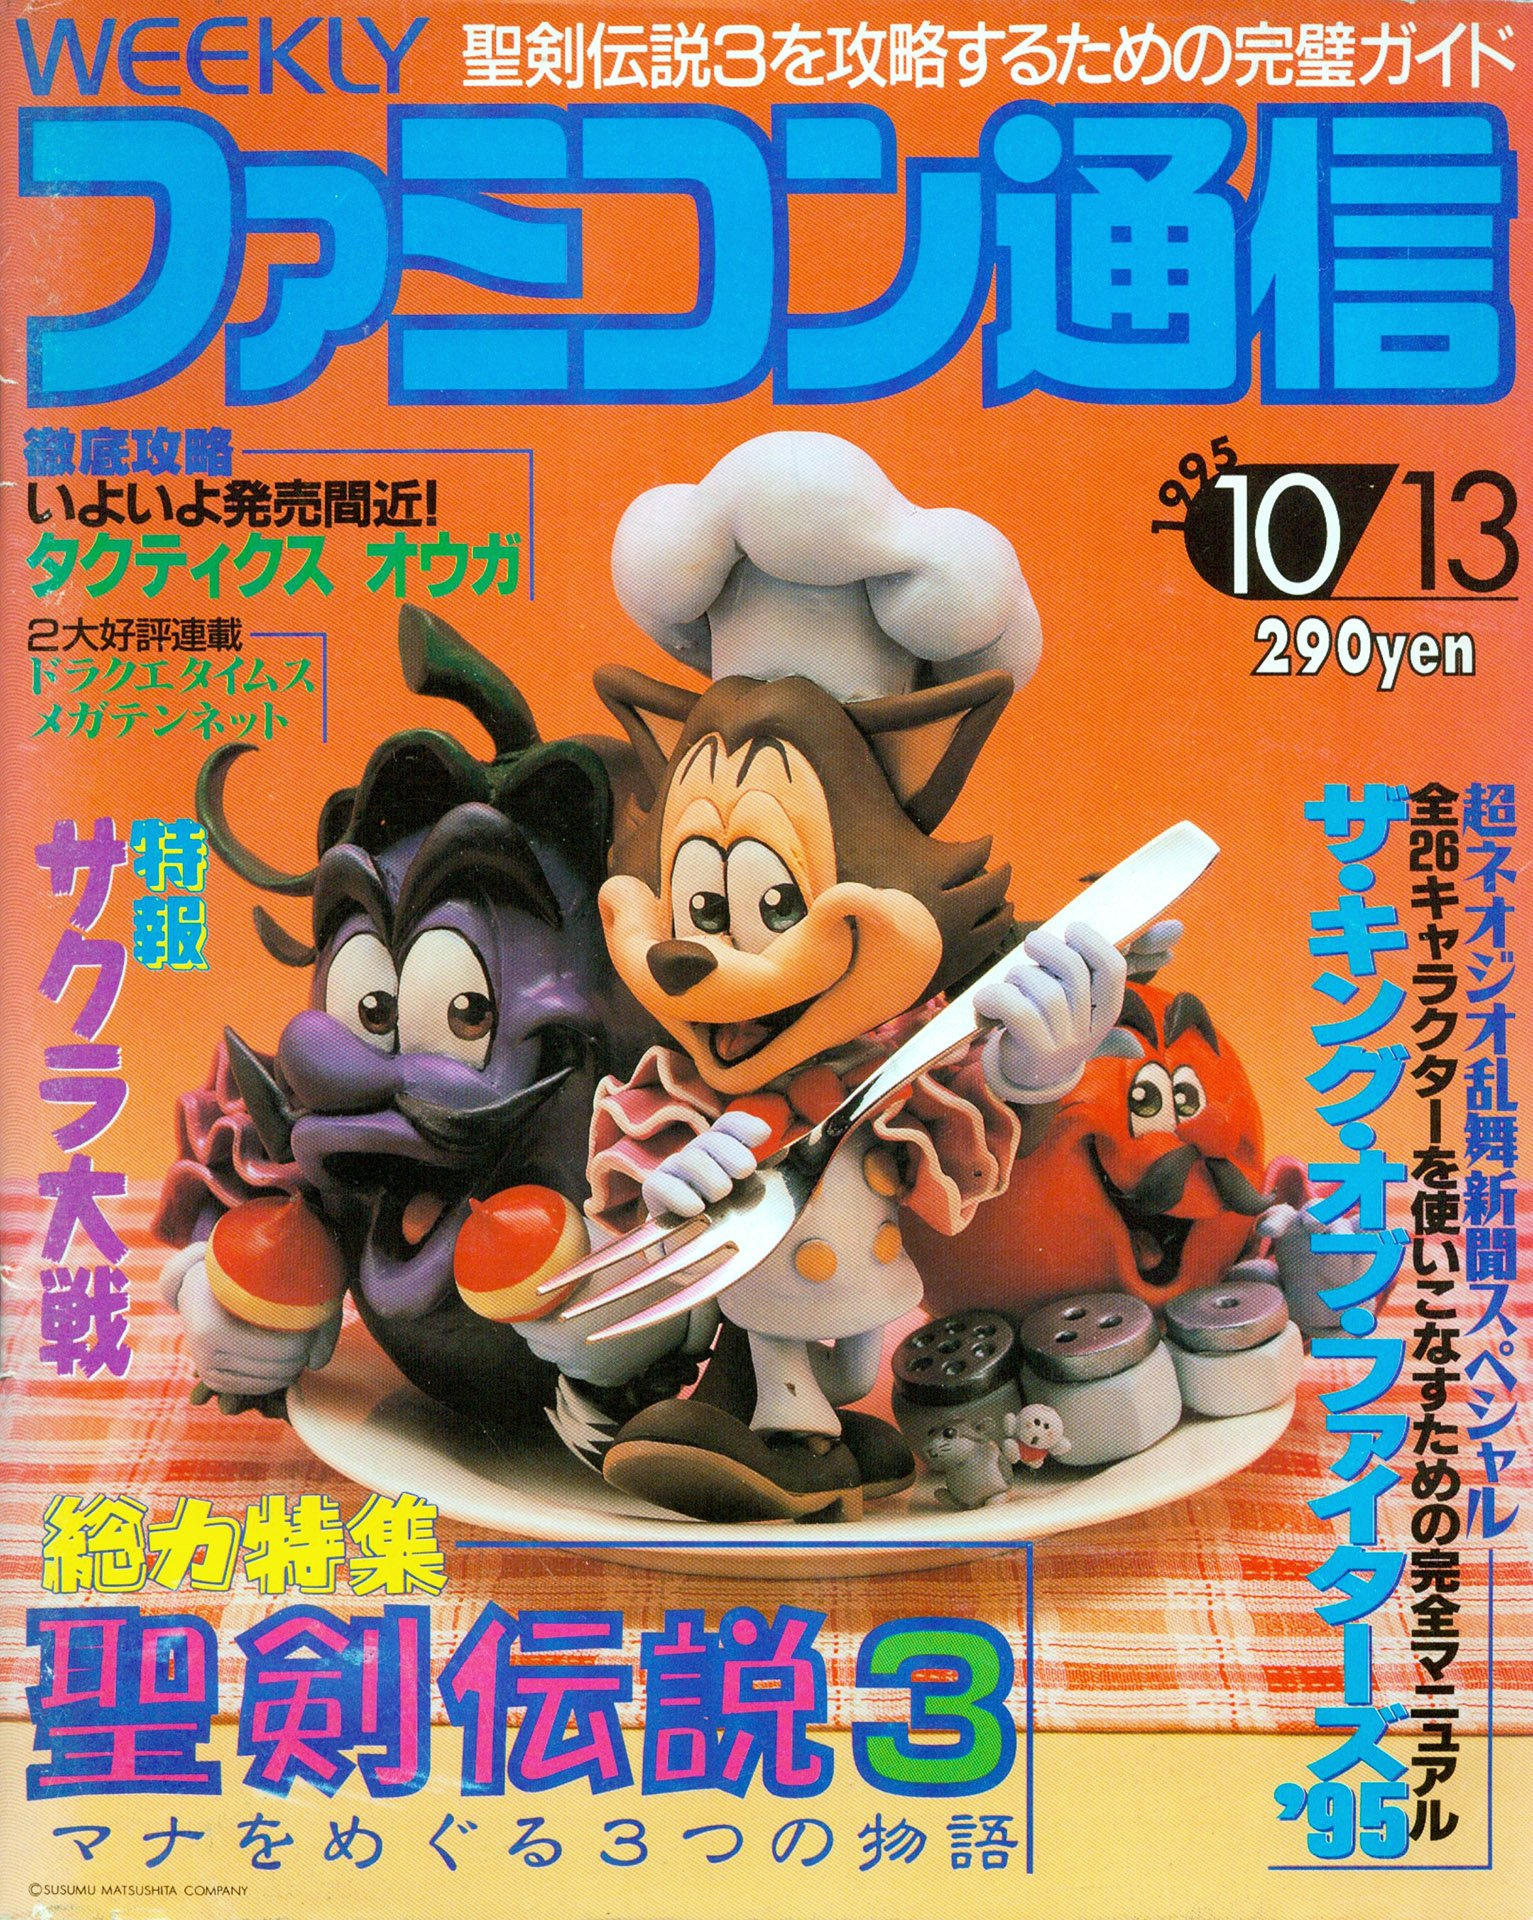 Famitsu 0356 (October 13, 1995)